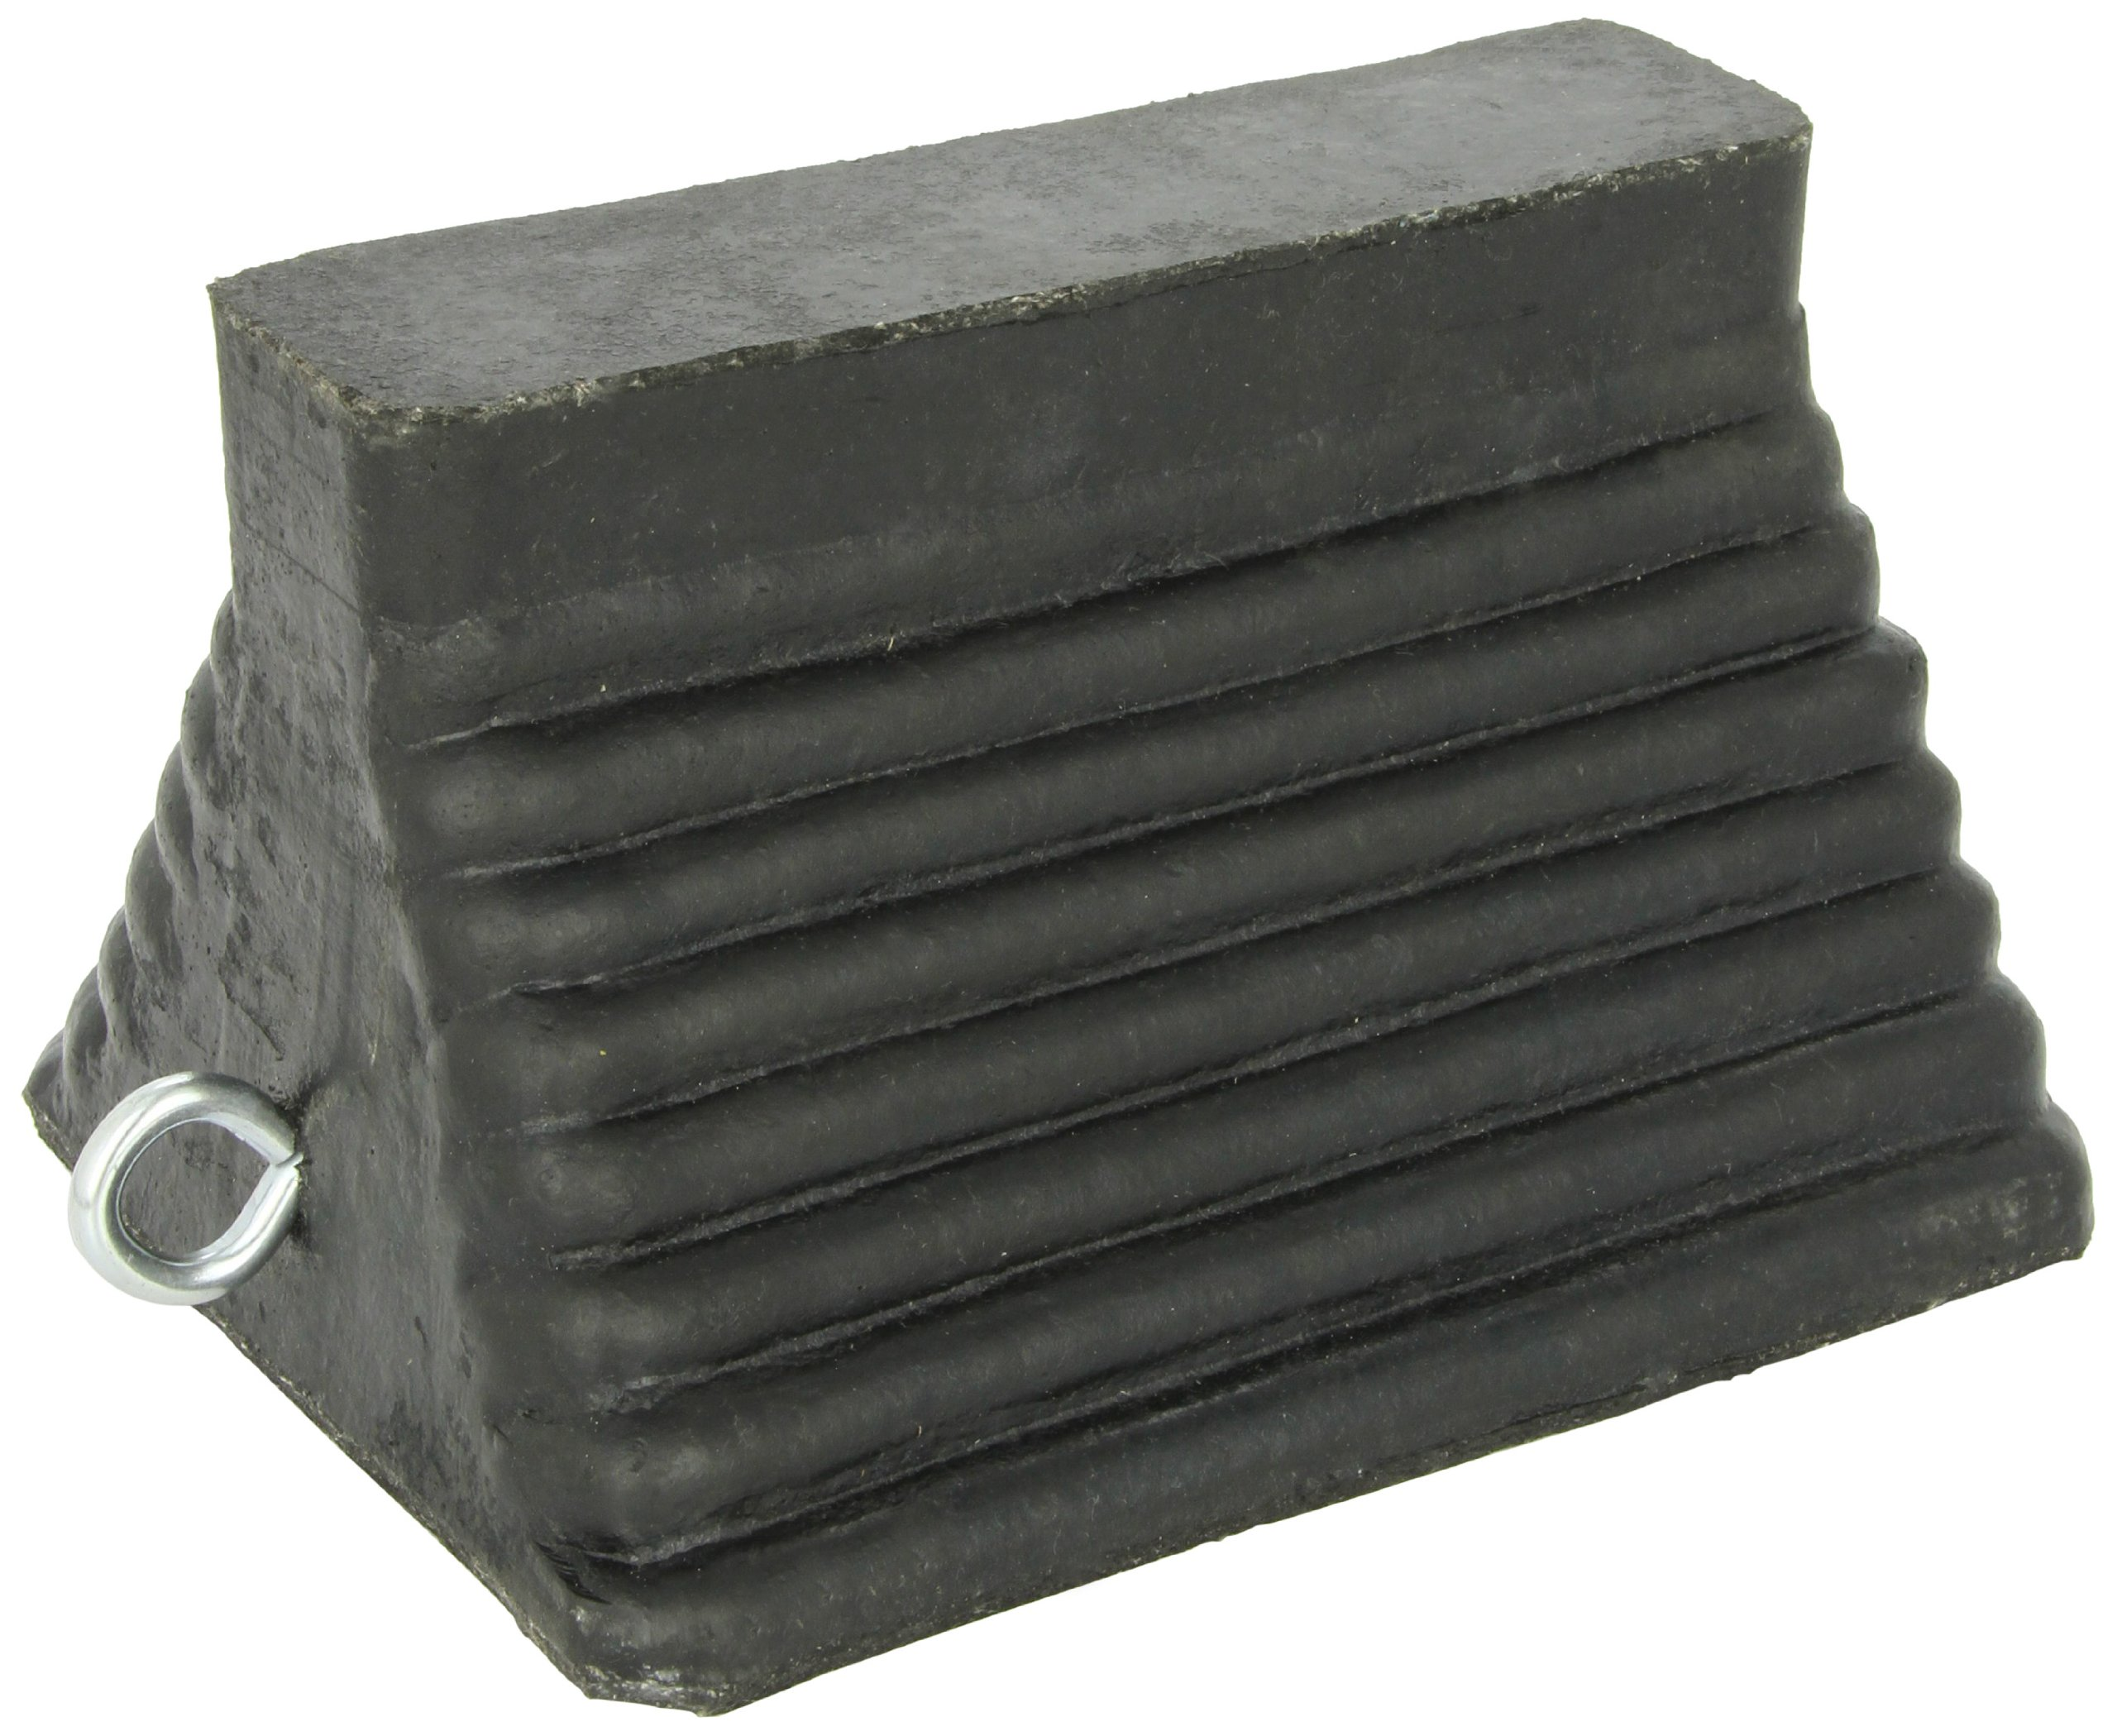 Durable Corporation Black Molded Wheel Chock, 9'' Length x 8'' Width x 5-3/4'' Height